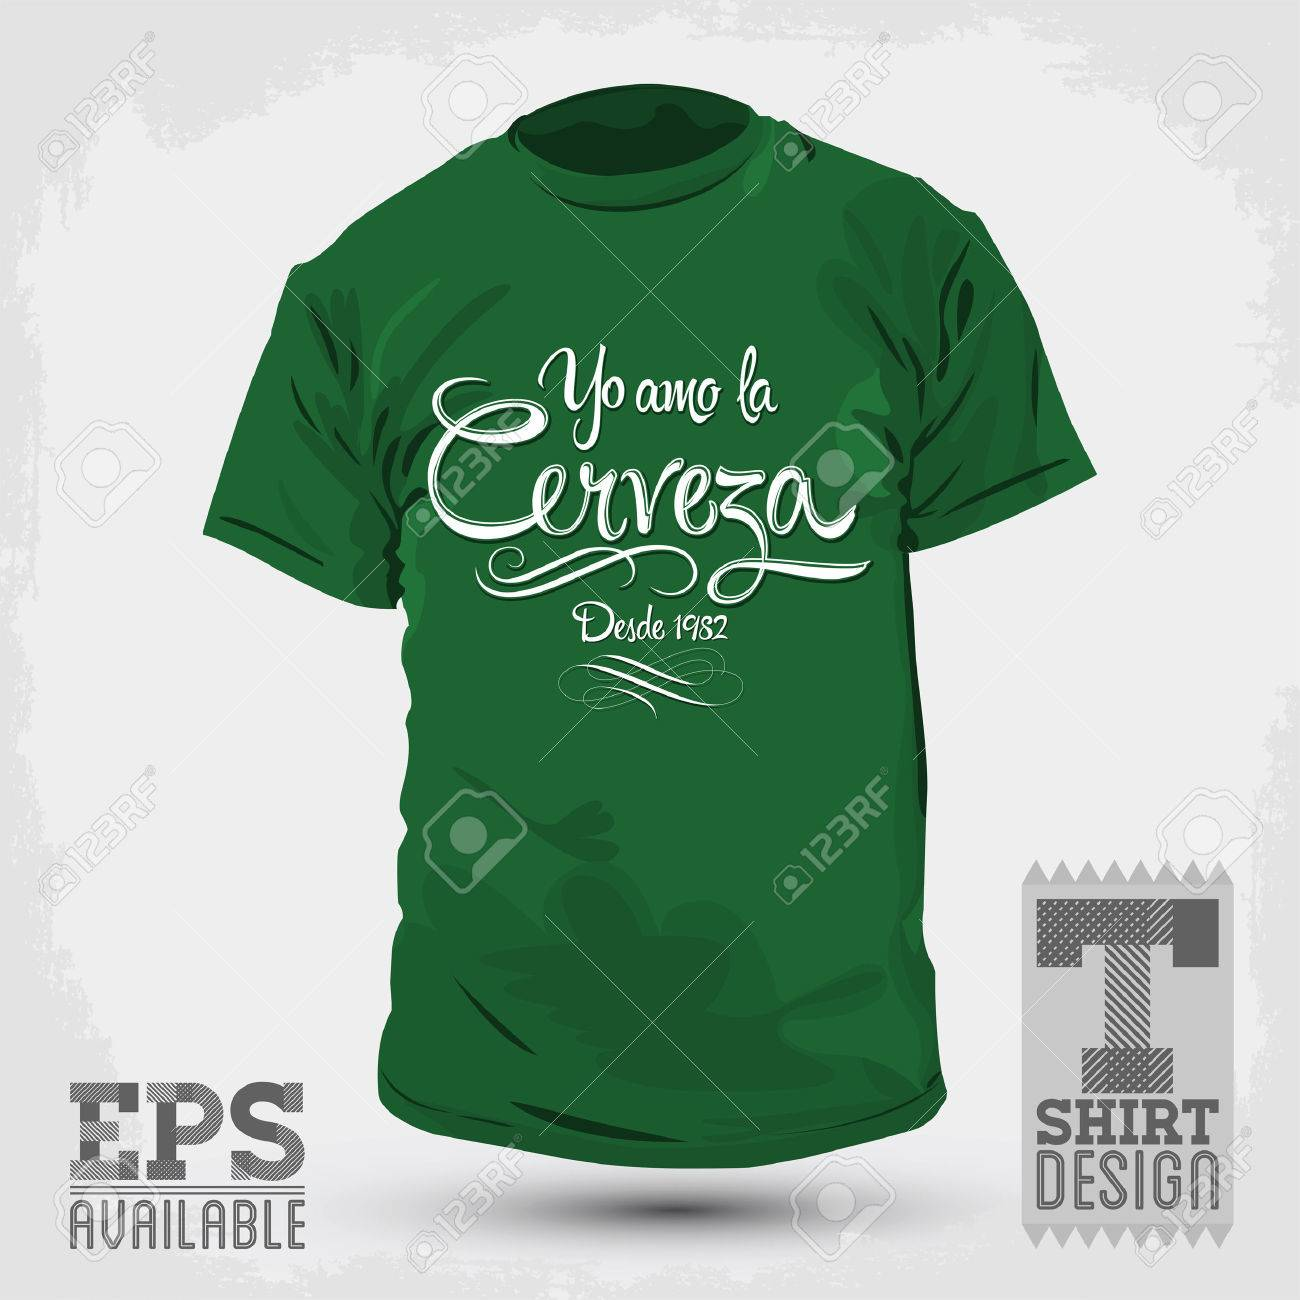 Shirt design green - Green Shirt Graphic T Shirt Design Yo Amo La Cerveza I Love